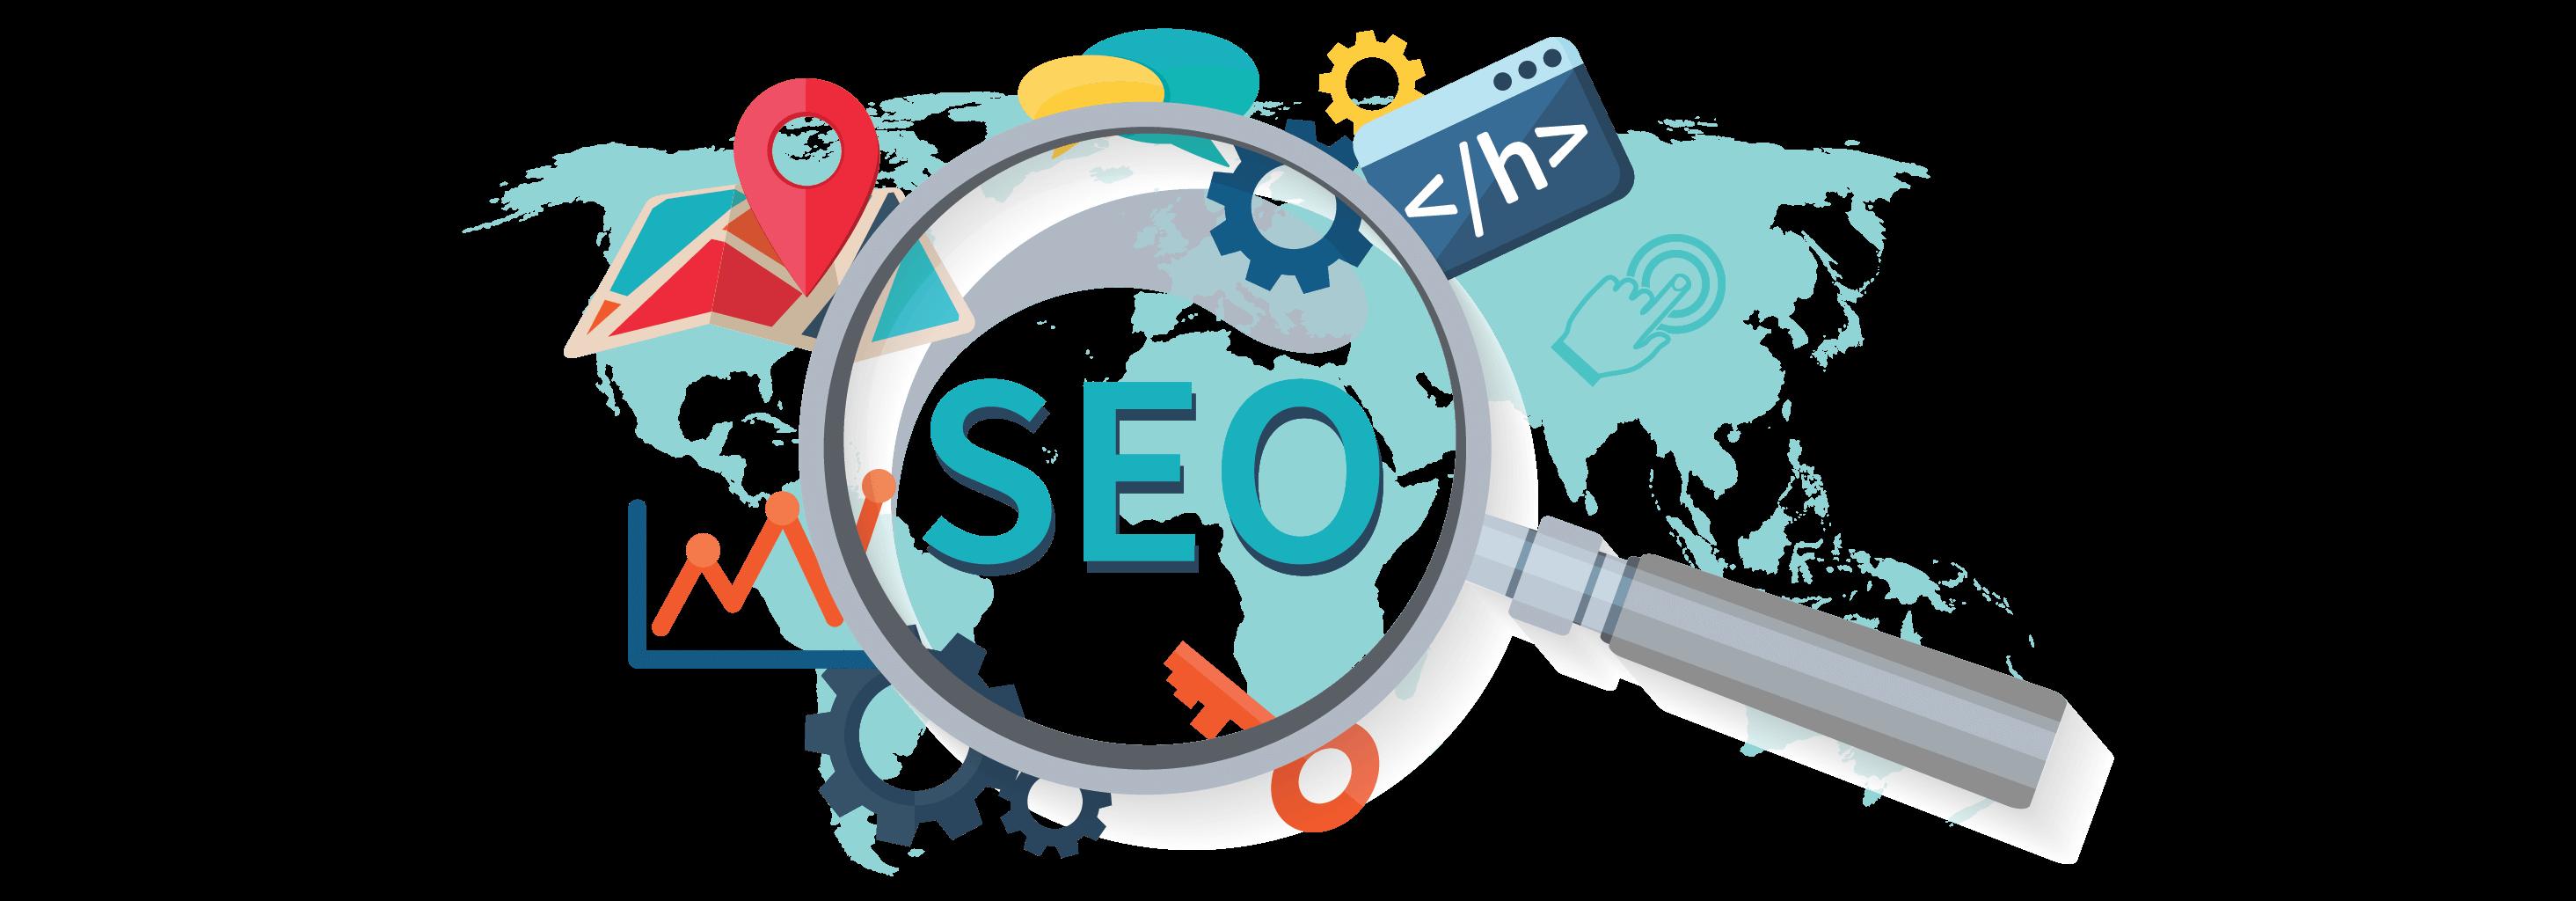 SEO Optimized & Google Friendly